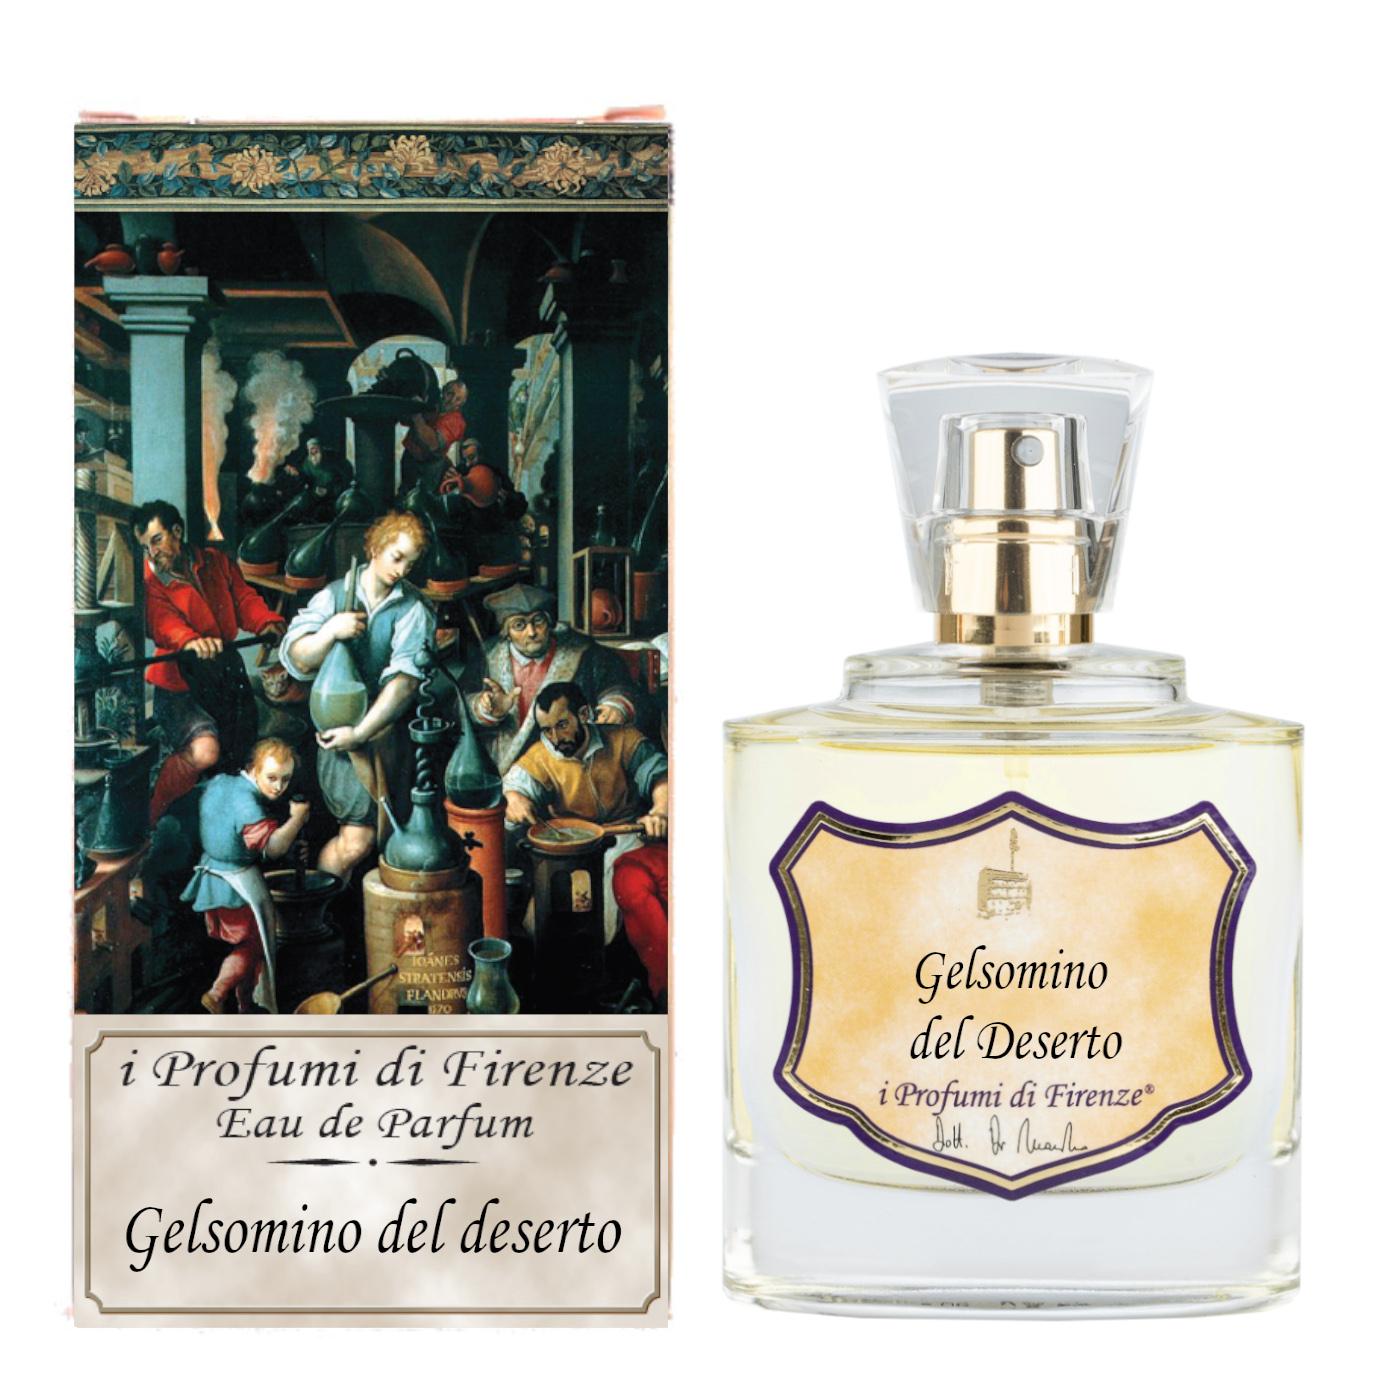 GELSOMINO DEL DESERTO - Eau de Parfum-4119